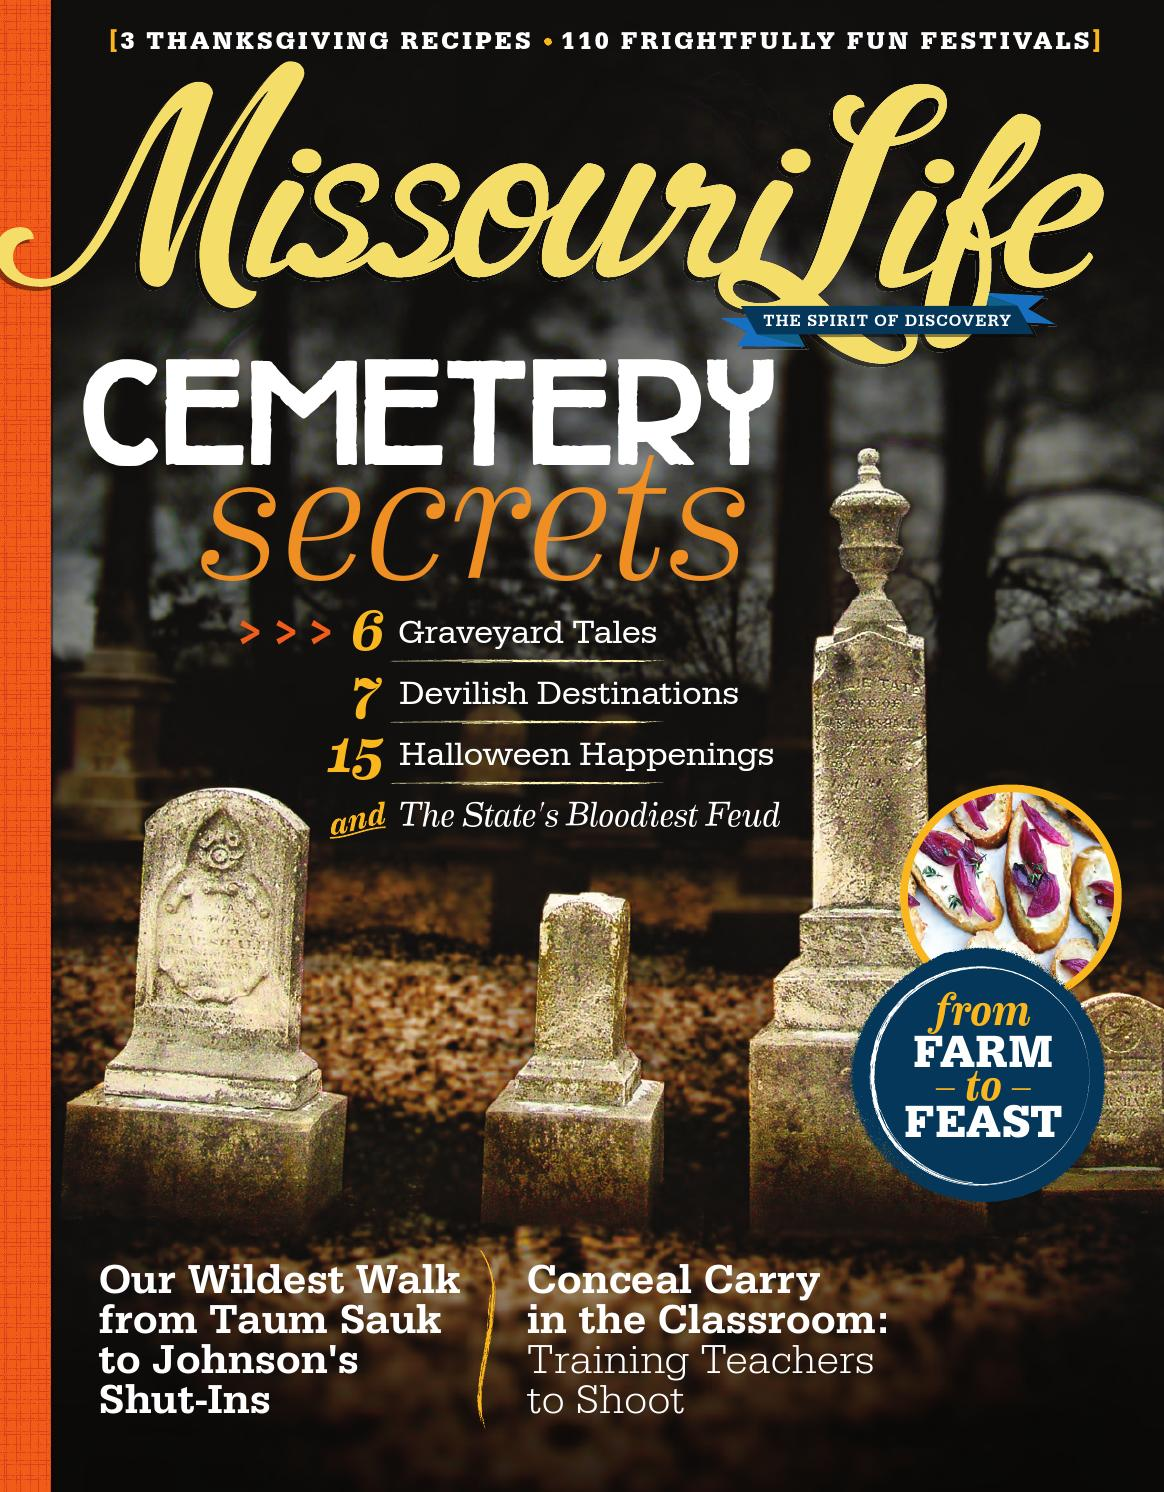 7ecbdceec4 Missouri Life October November 2014 by Missouri Life Magazine - issuu